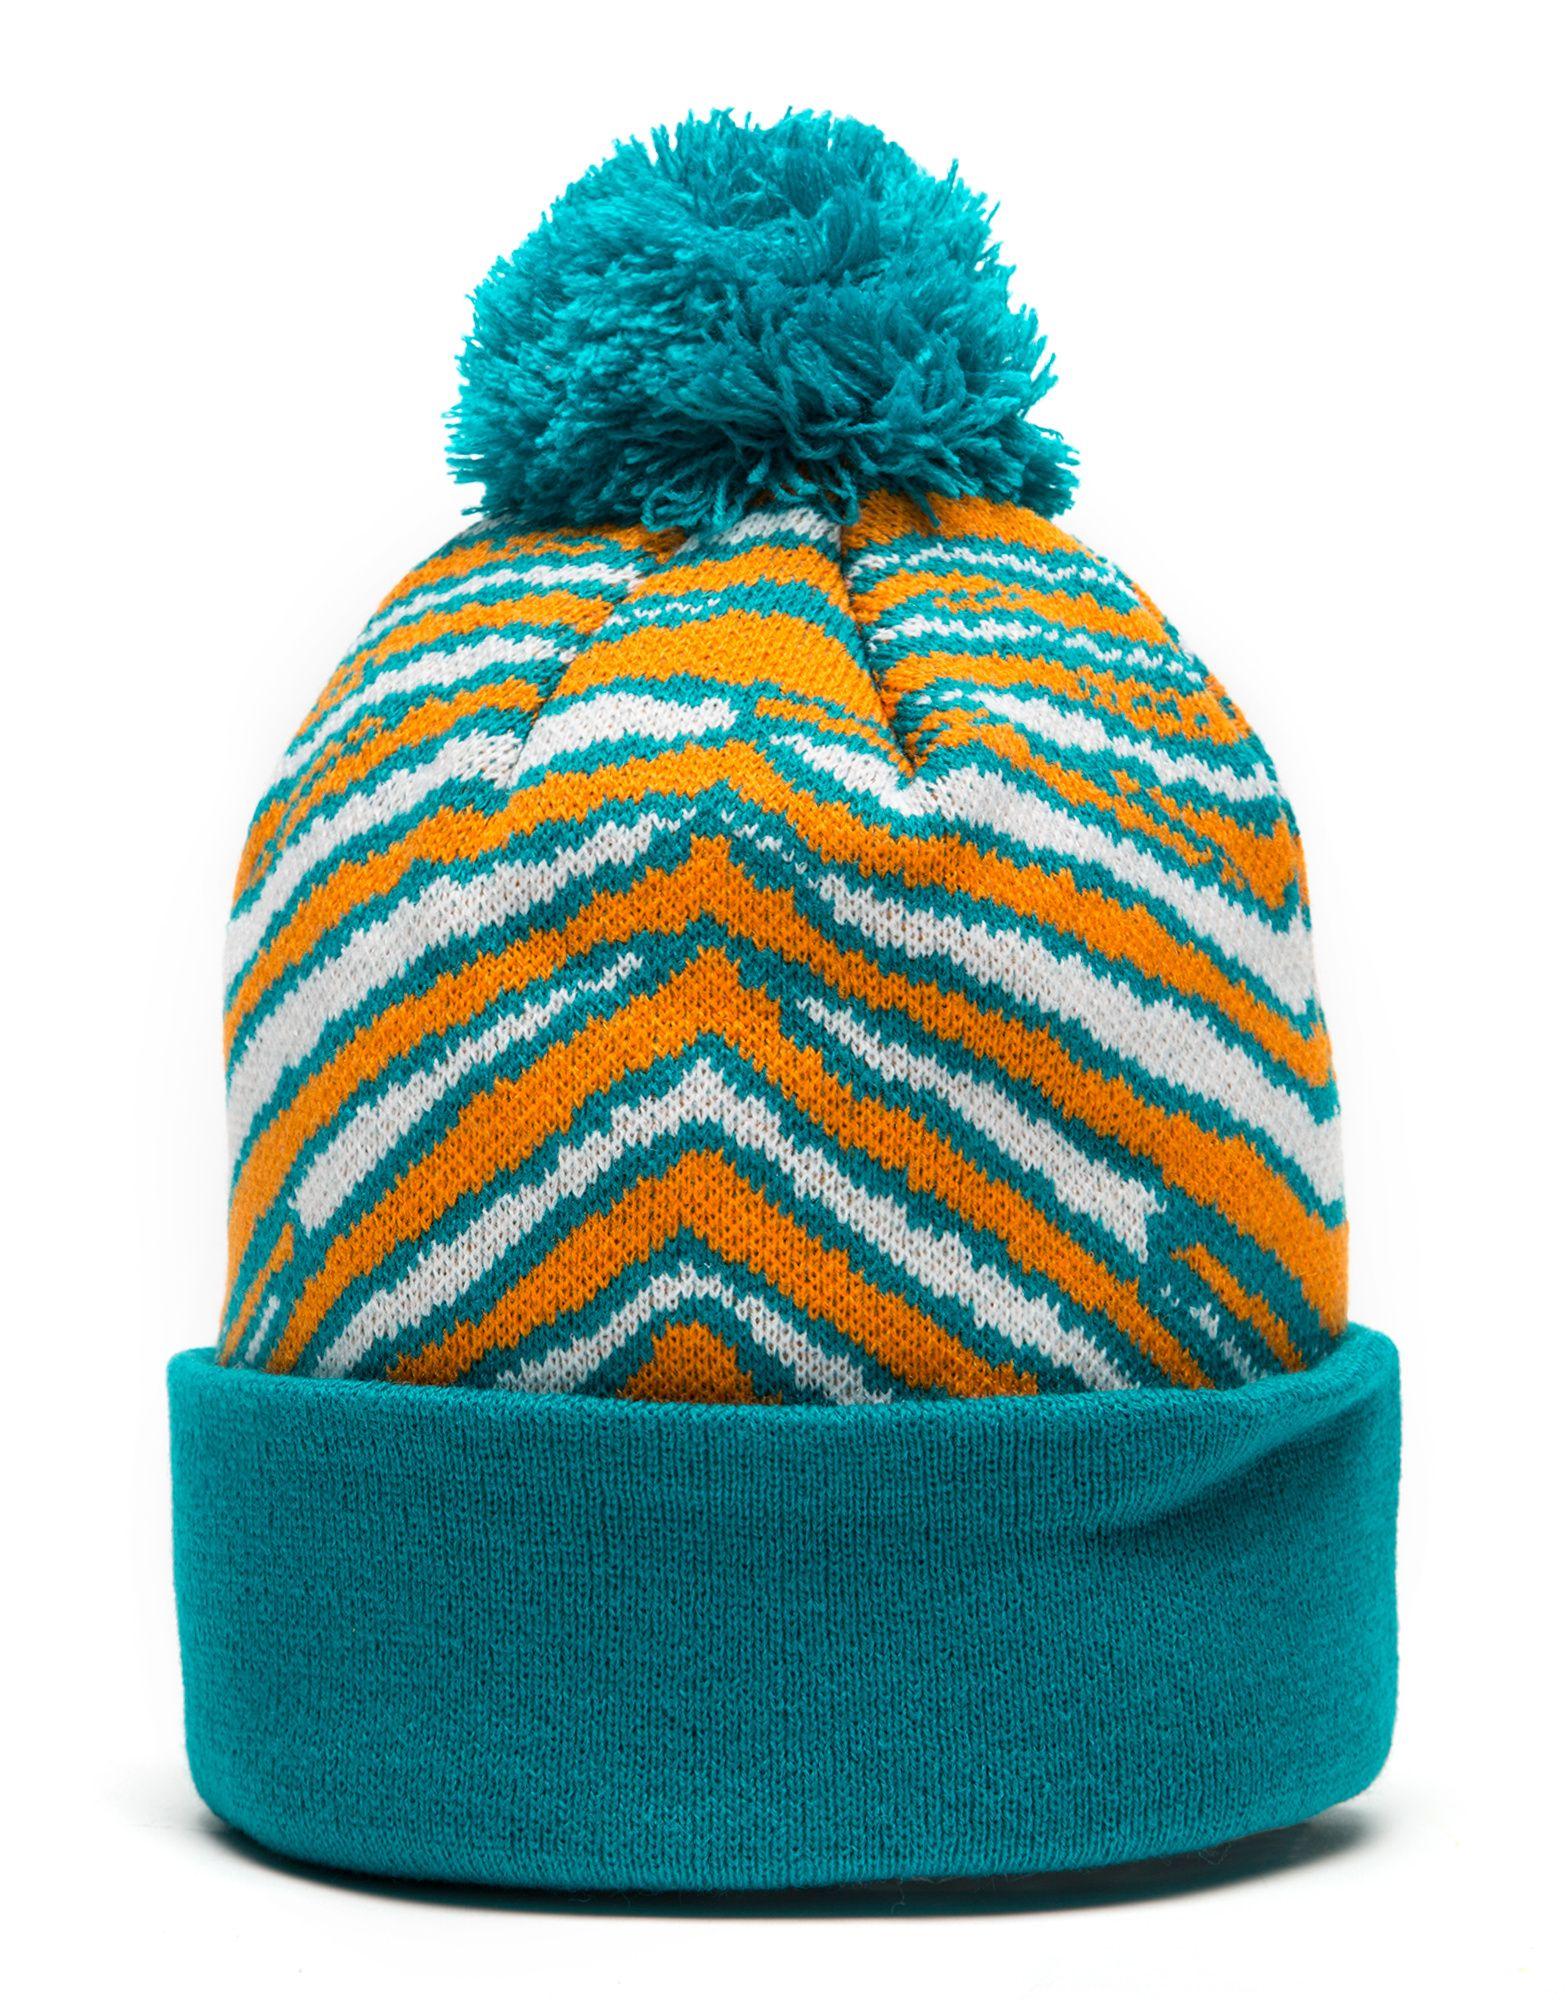 New Era NFL Miami Dolphins Zubaz Bobble Hat